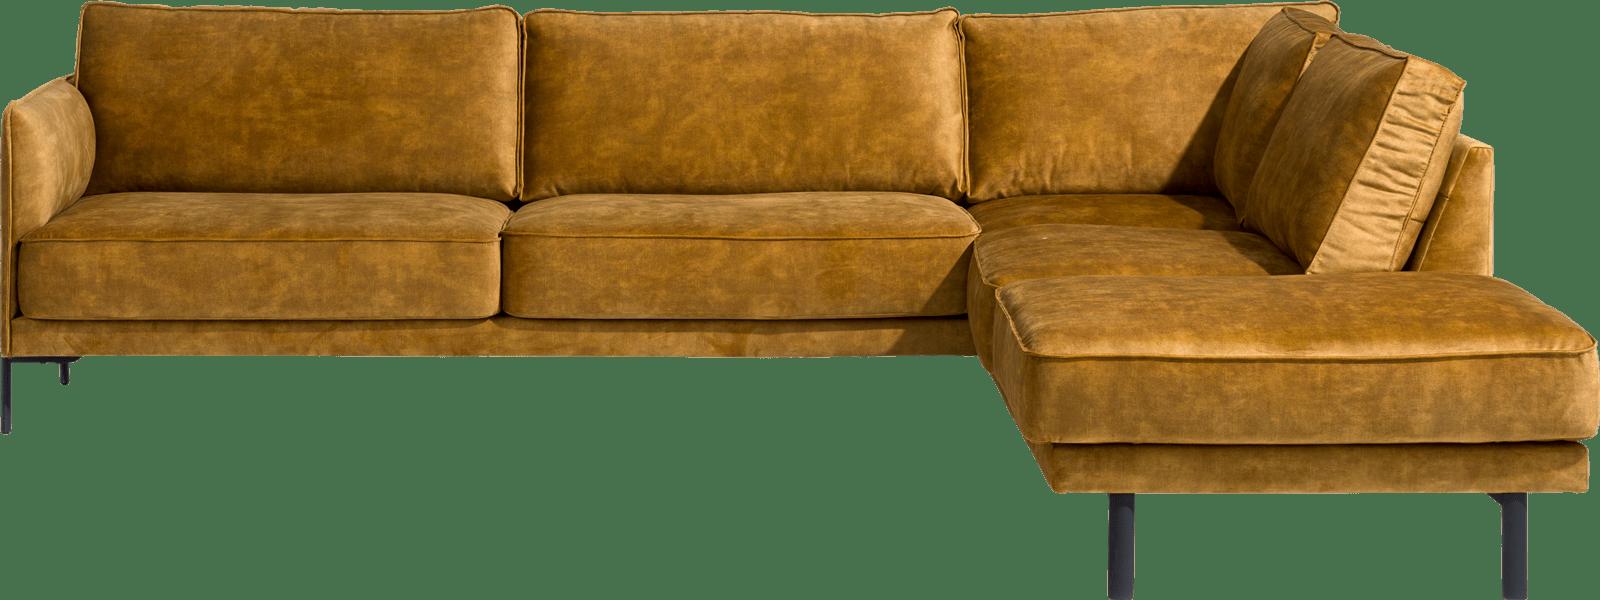 XOOON - Modena - Sofas - 3 Sitzer Armlehne Links - Ottomane Rechts